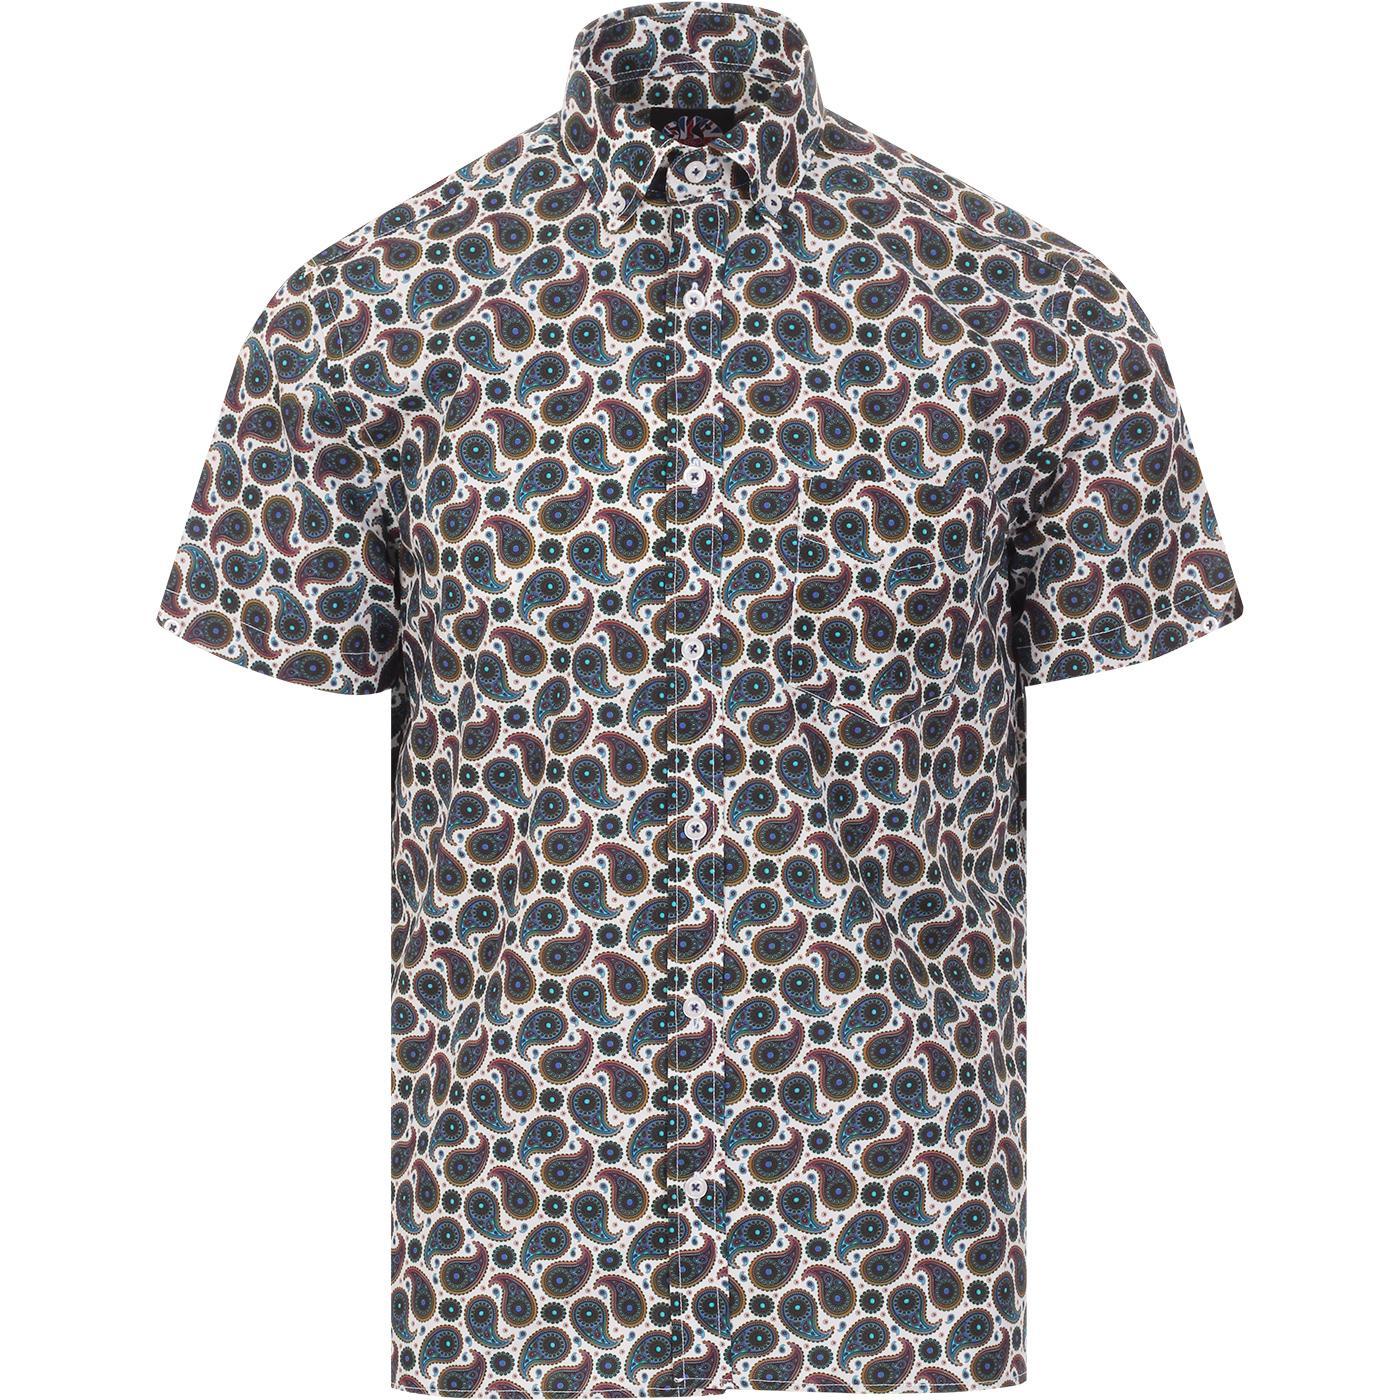 SKA & SOUL 60s Mod SS Paisley Button Down Shirt